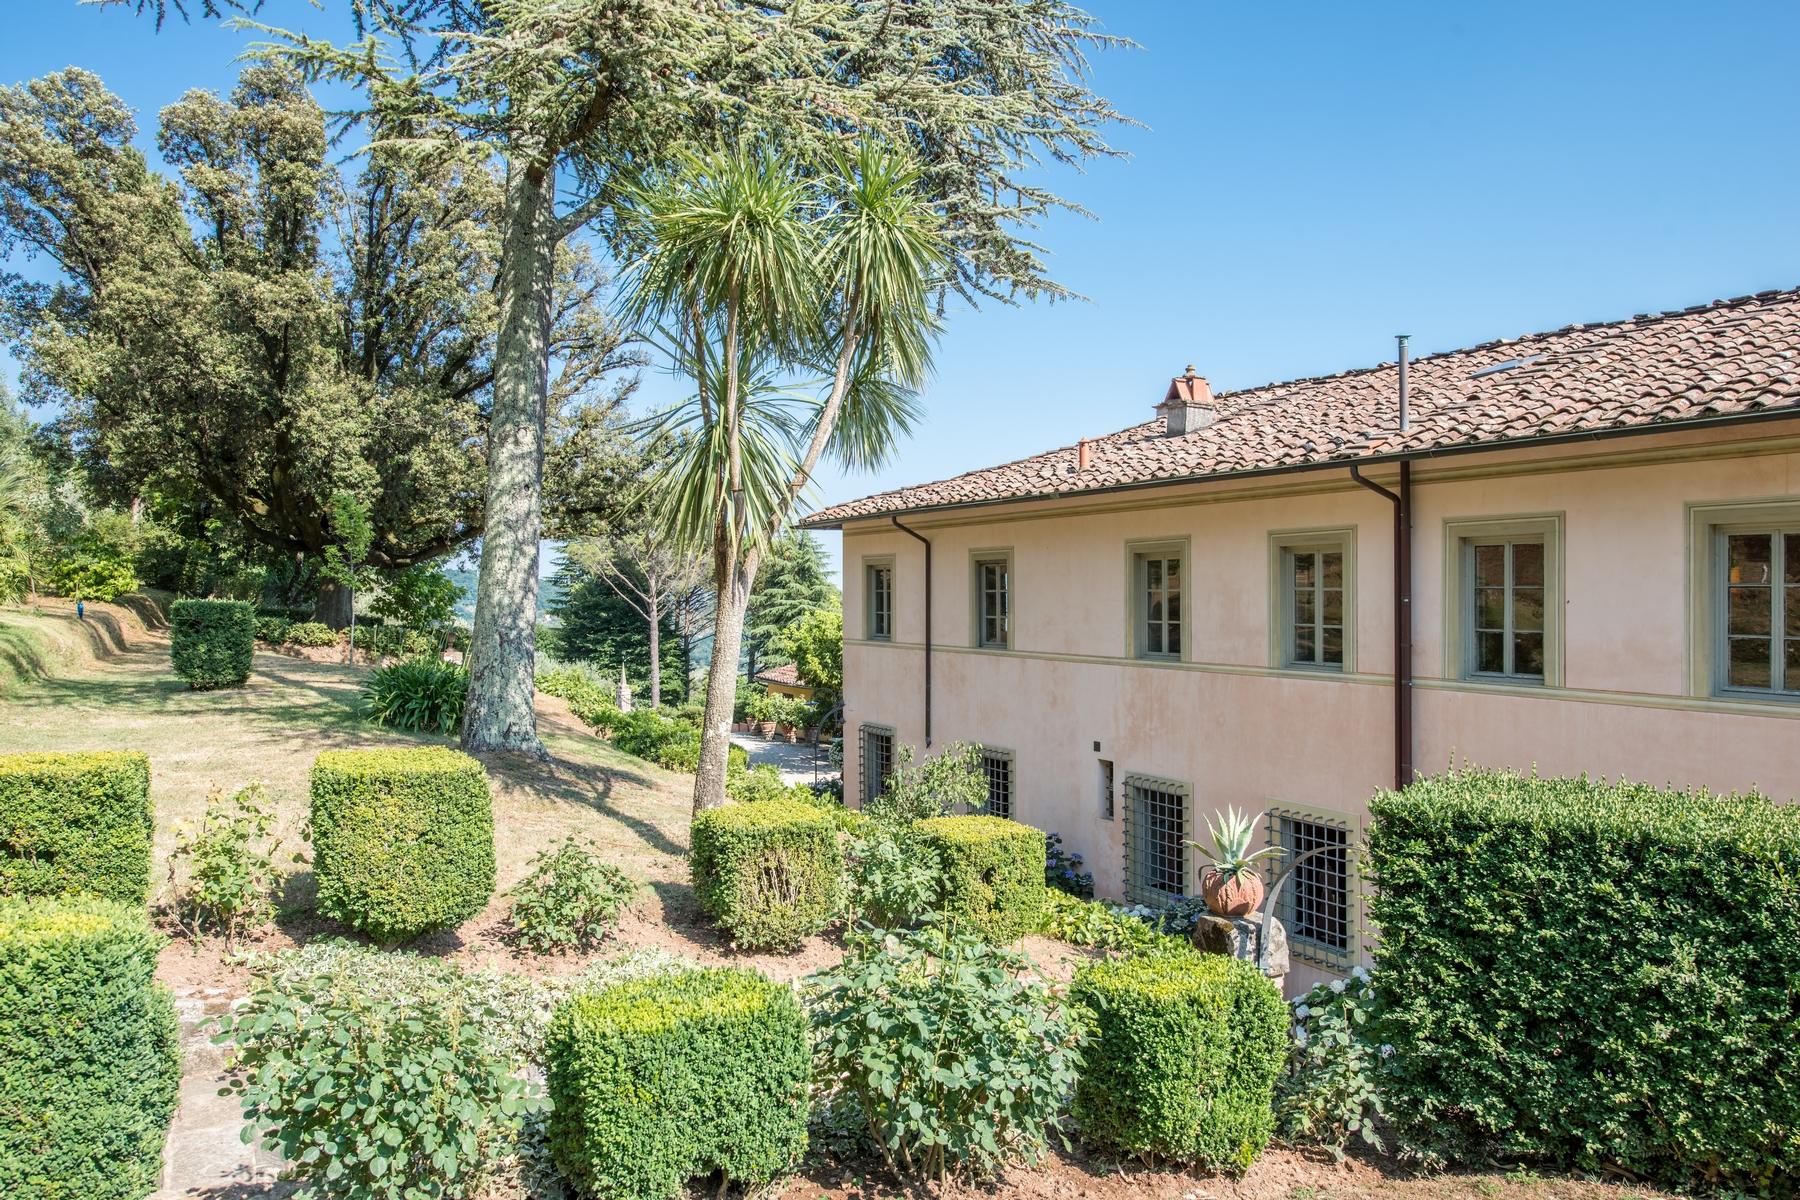 Villa in Vendita a Lucca: 5 locali, 2500 mq - Foto 12